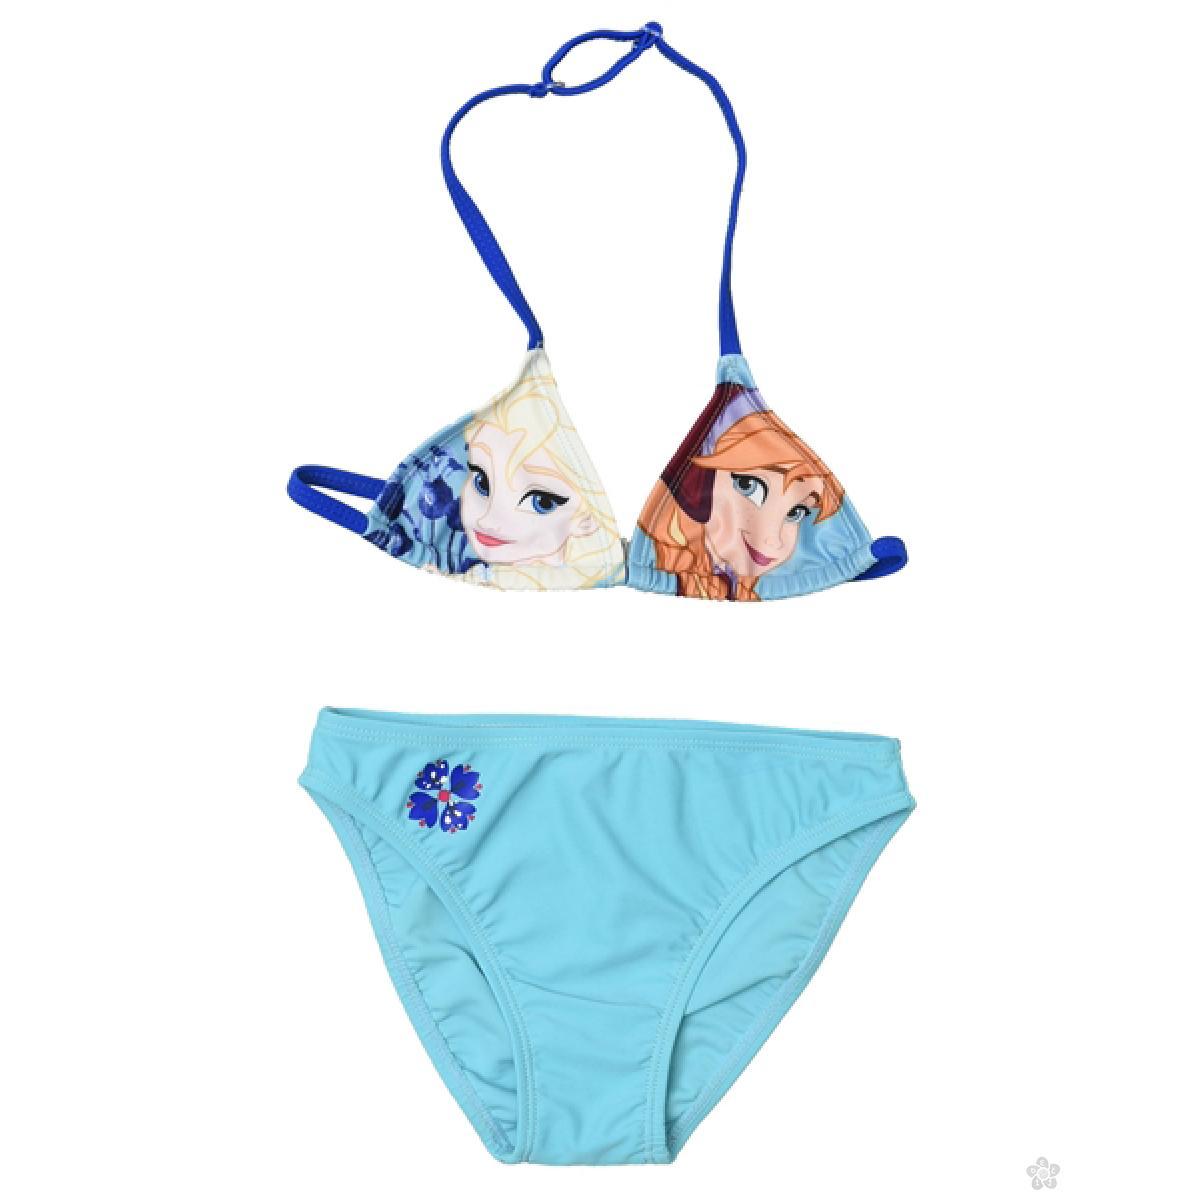 Dvodelni kupaći za devojčice - bikini Frozen, D94230